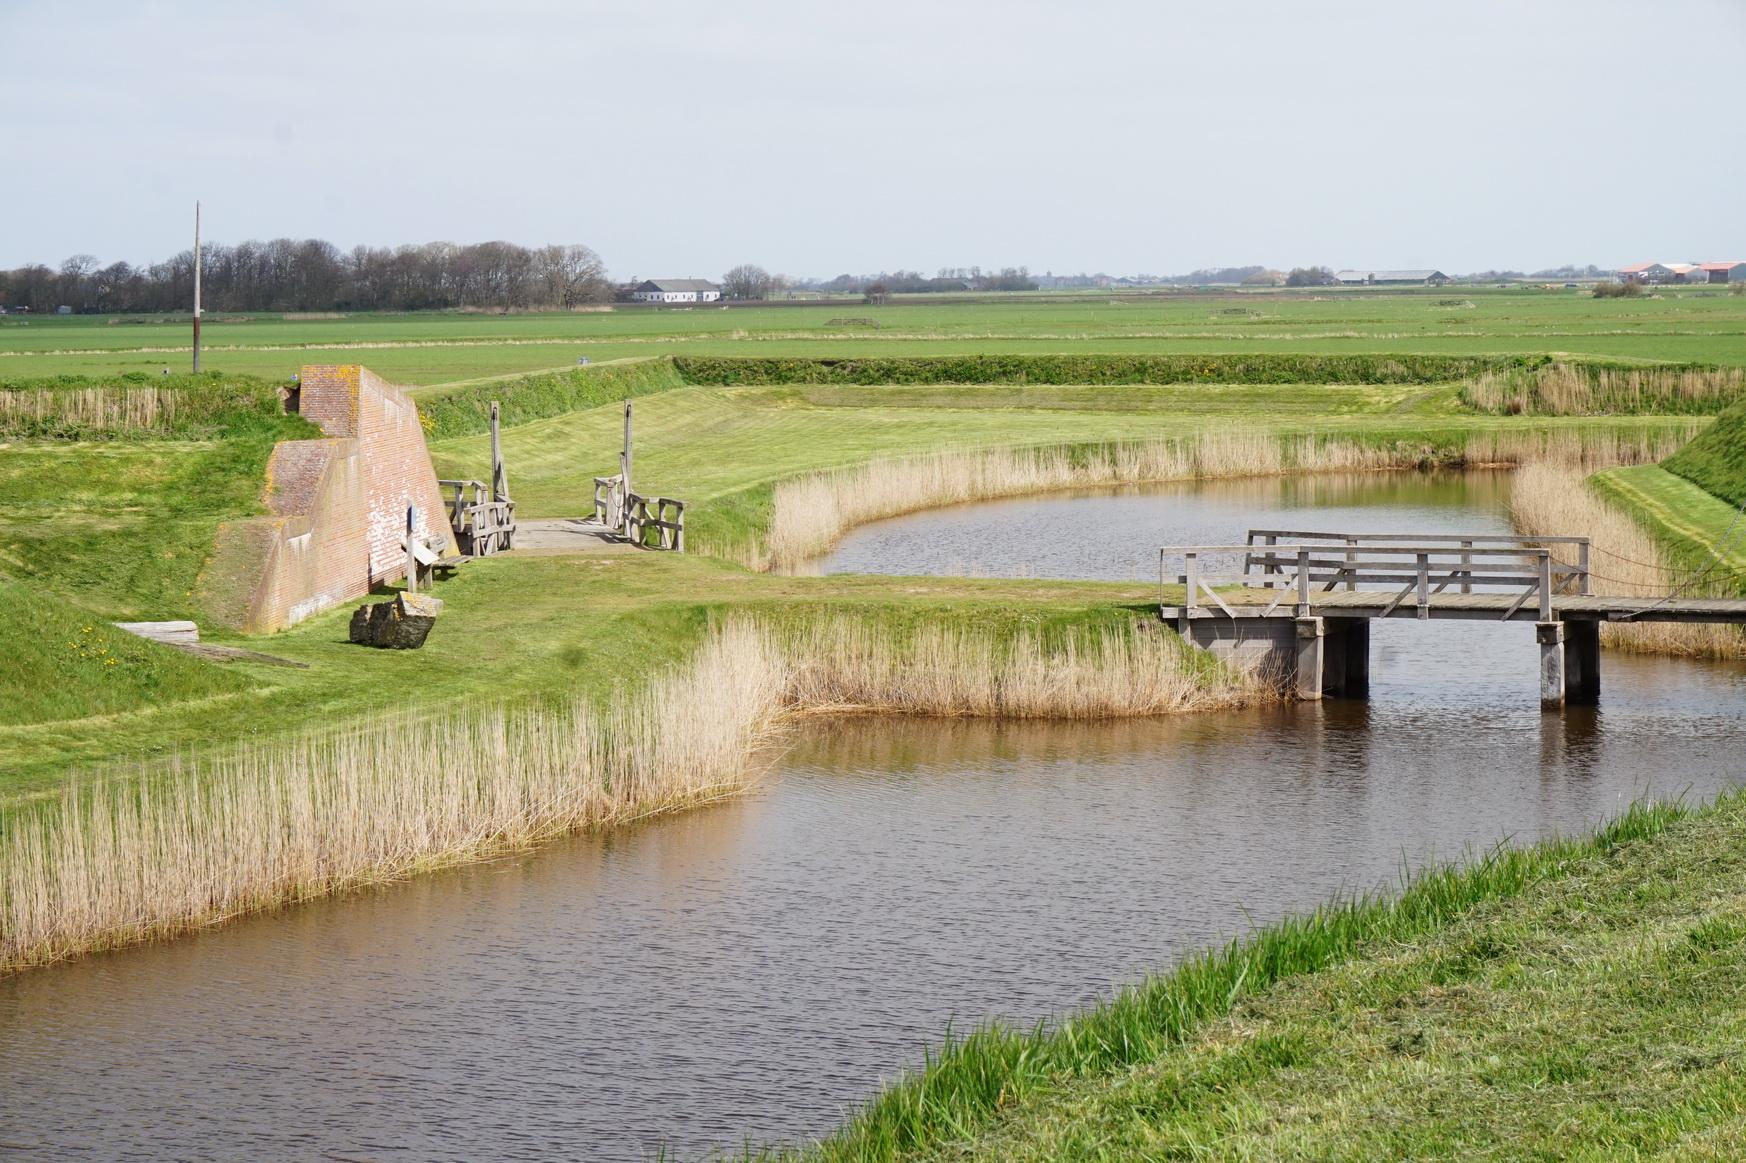 Texel - Wanderung VOC-Route 20